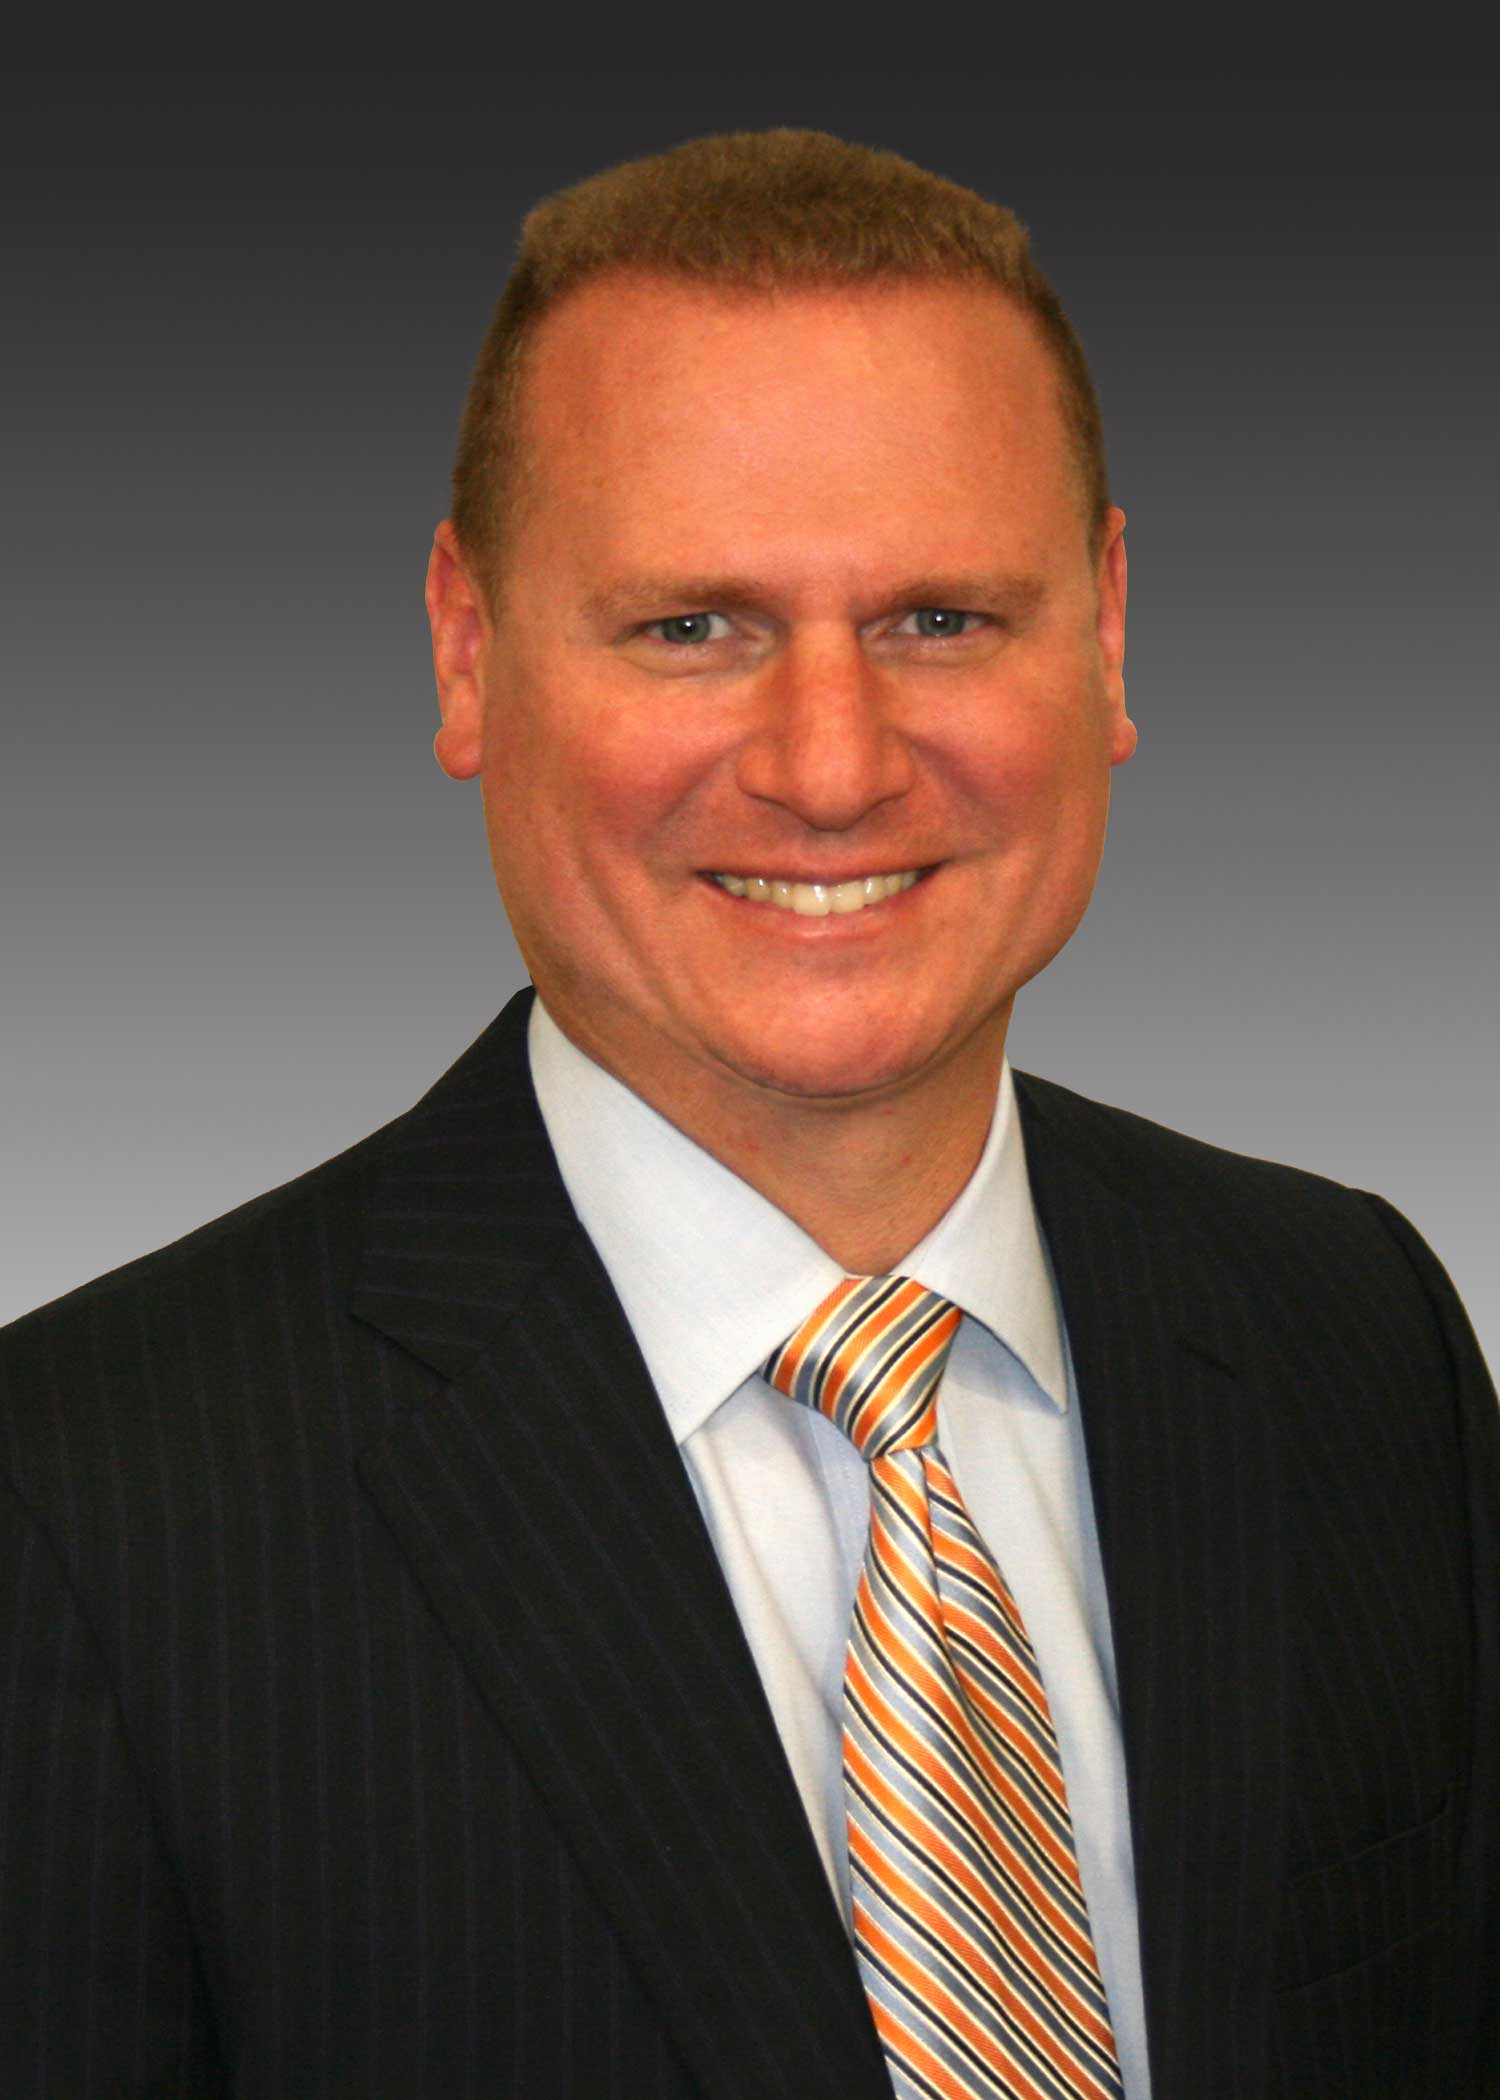 Brian Volner